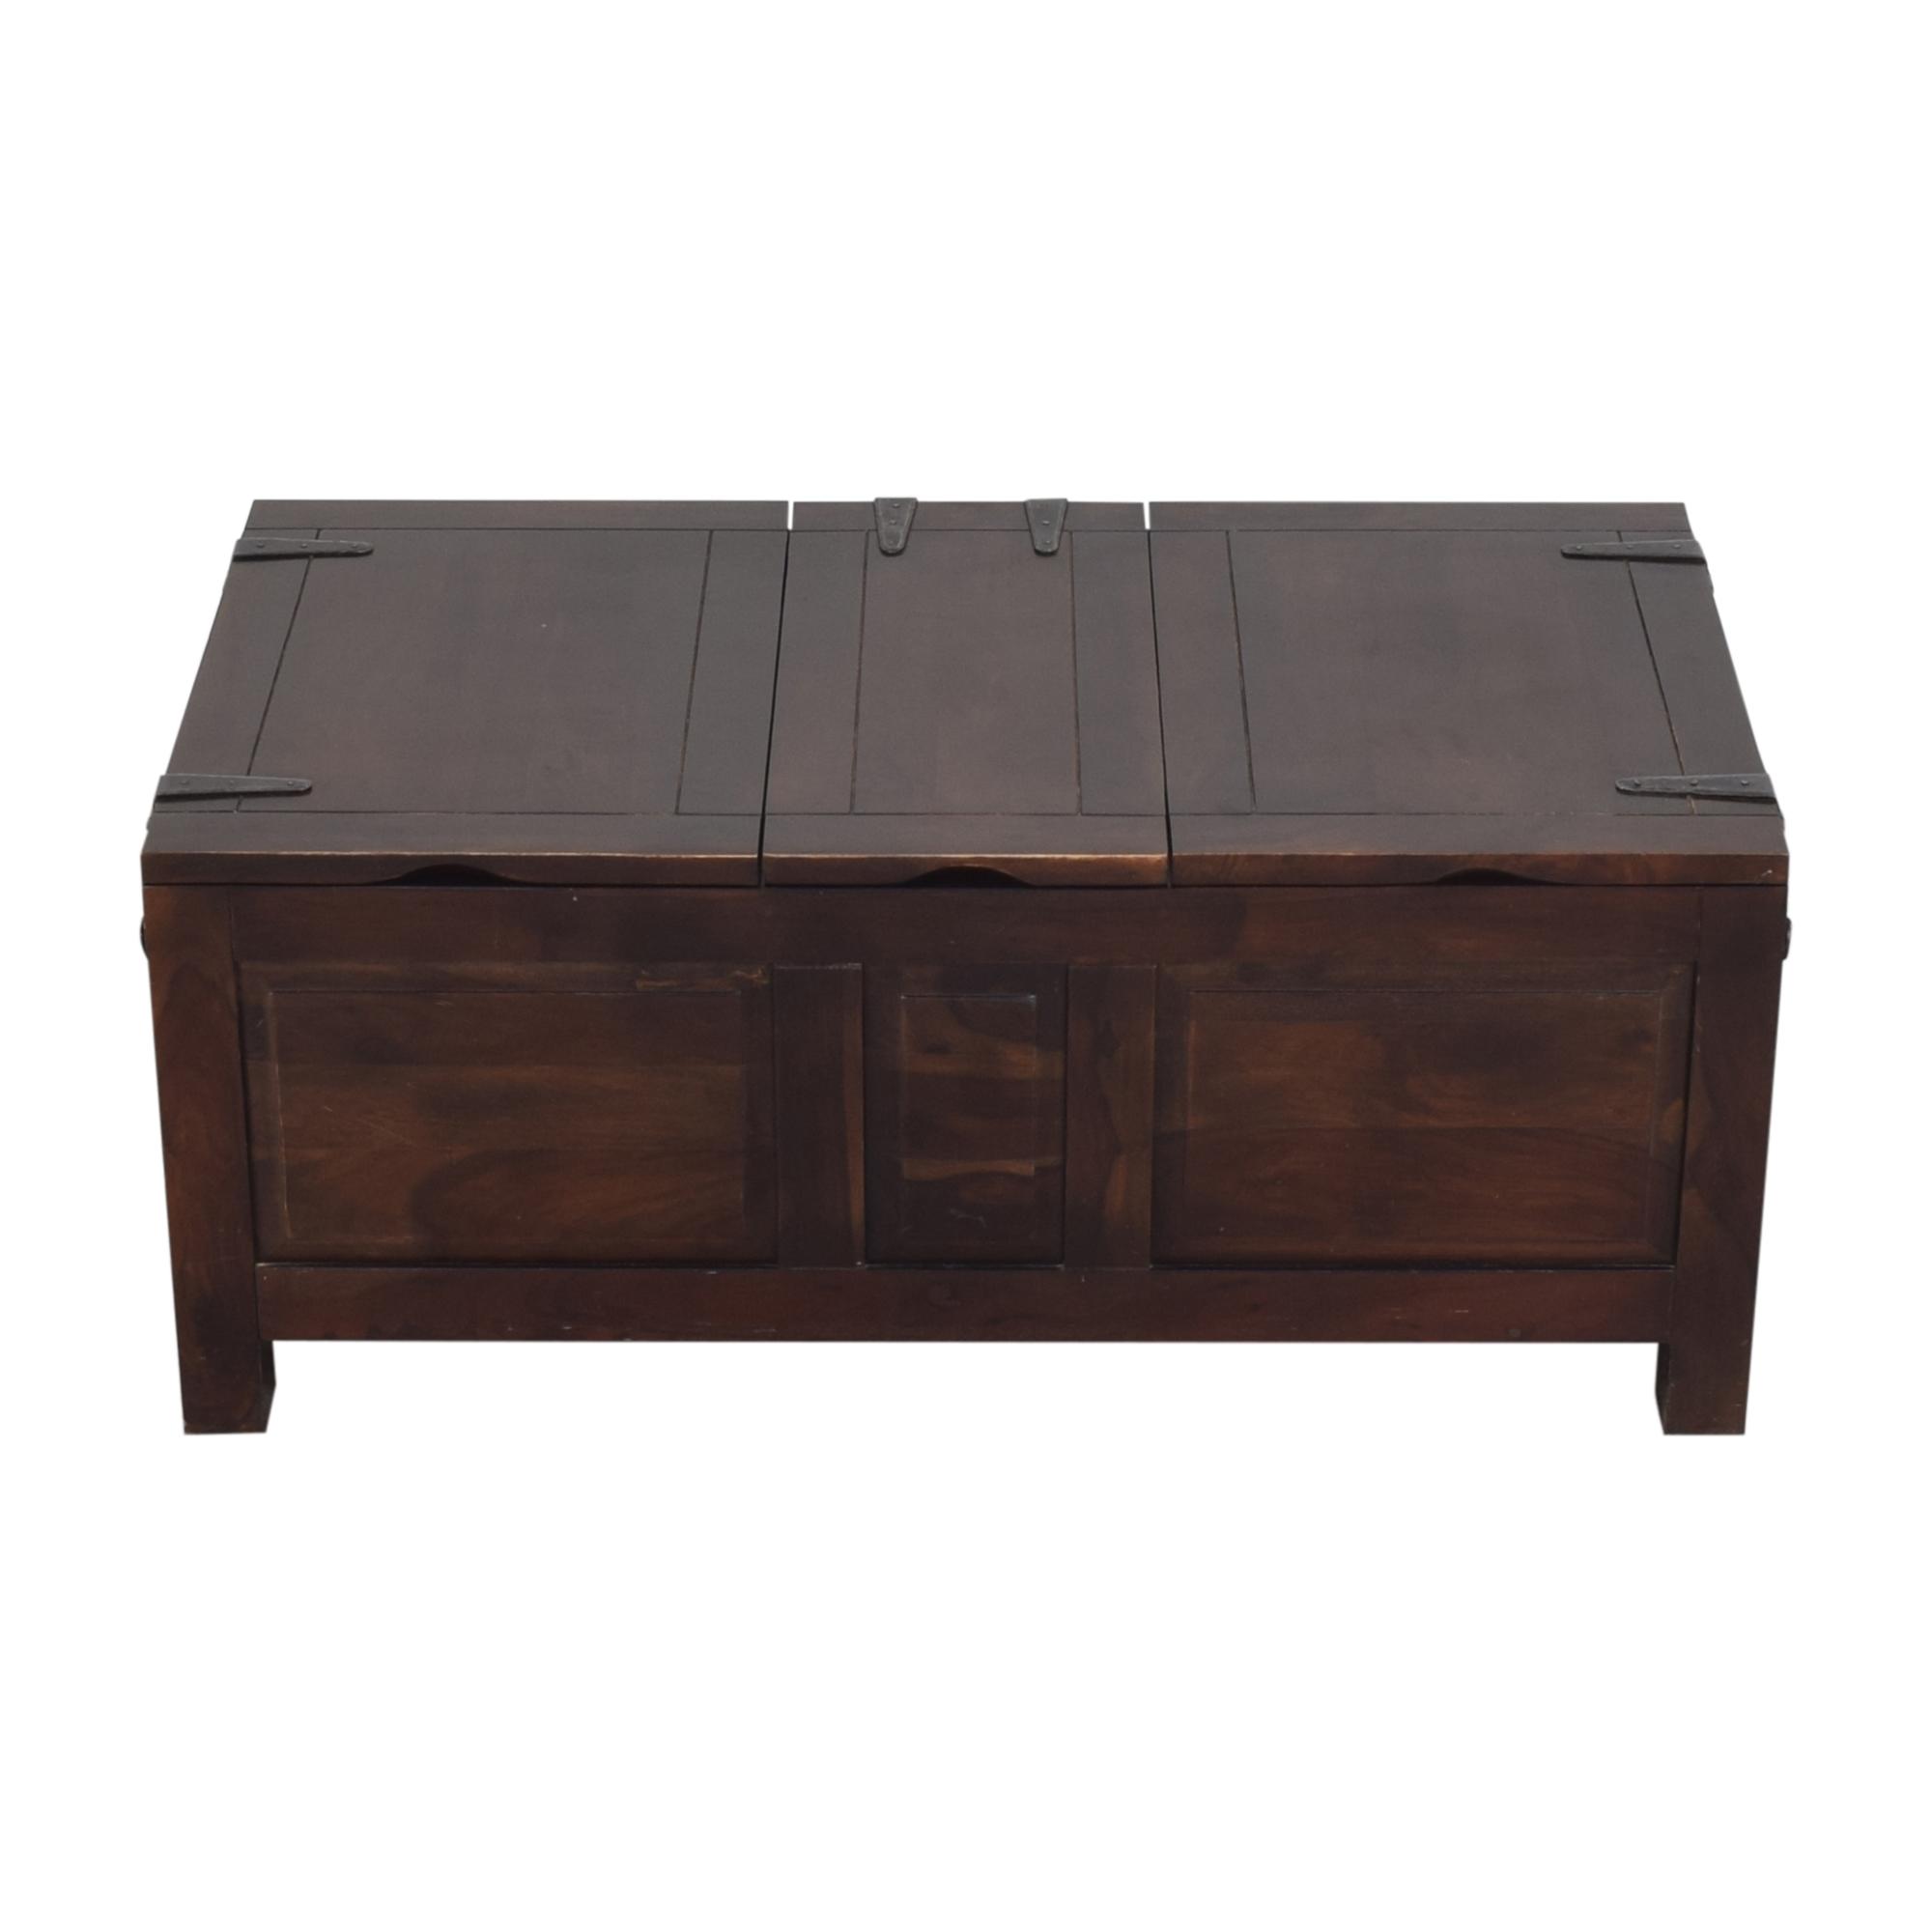 Crate & Barrel Crate & Barrel Hunter II Trunk Storage Coffee Table Trunks